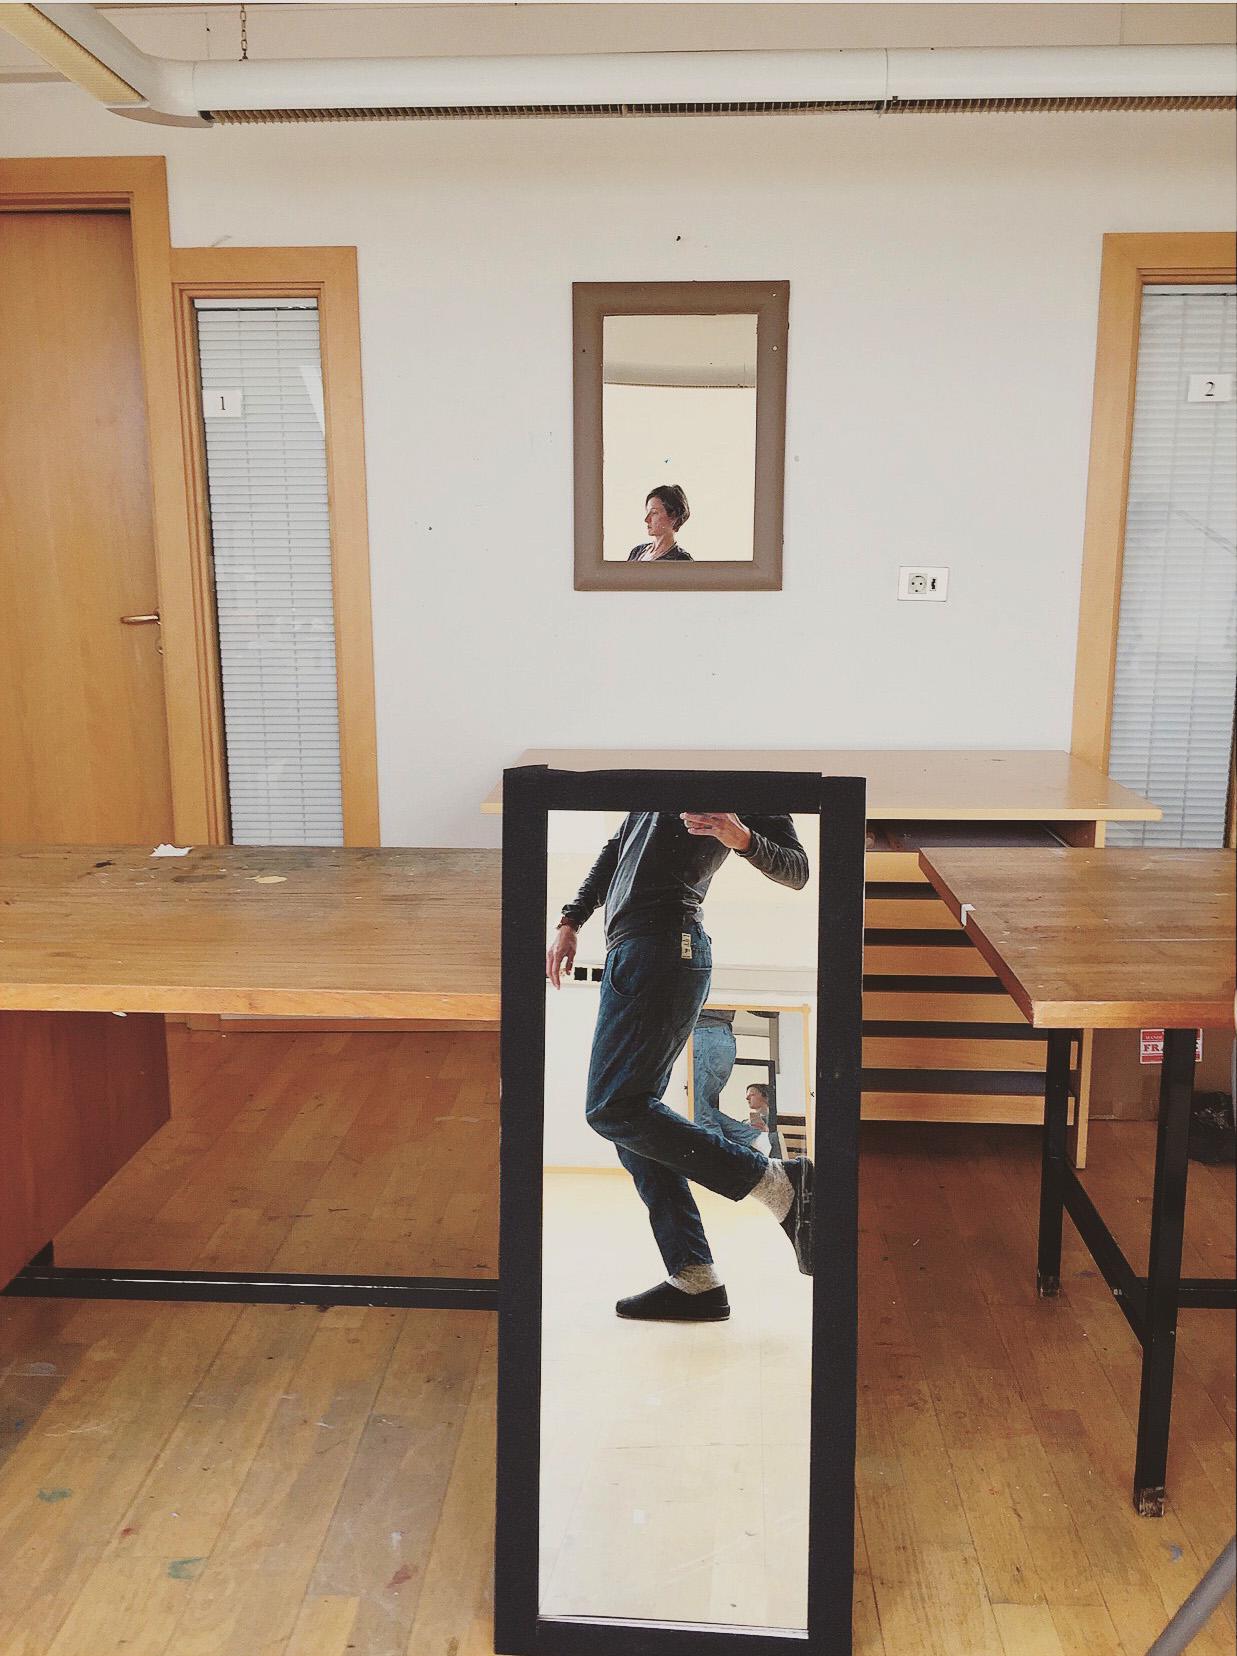 Untitled: Selfie, Archival Inkjet Print, 2015